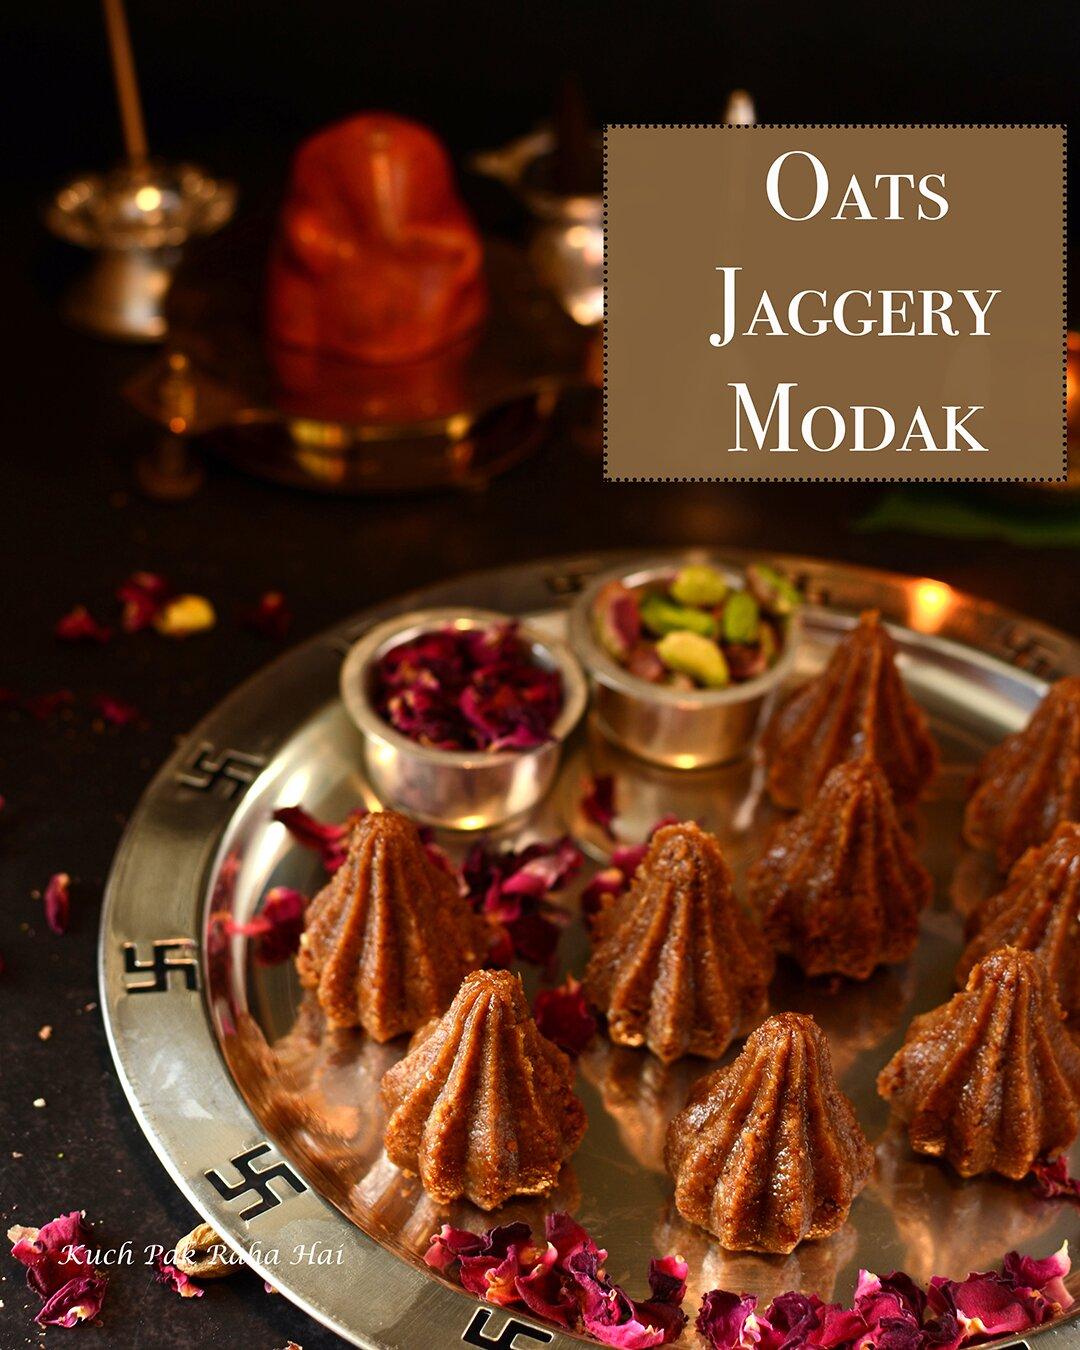 Oats Jaggery Modak Recipe Healthy Modak Ganesh Chaturthi Special